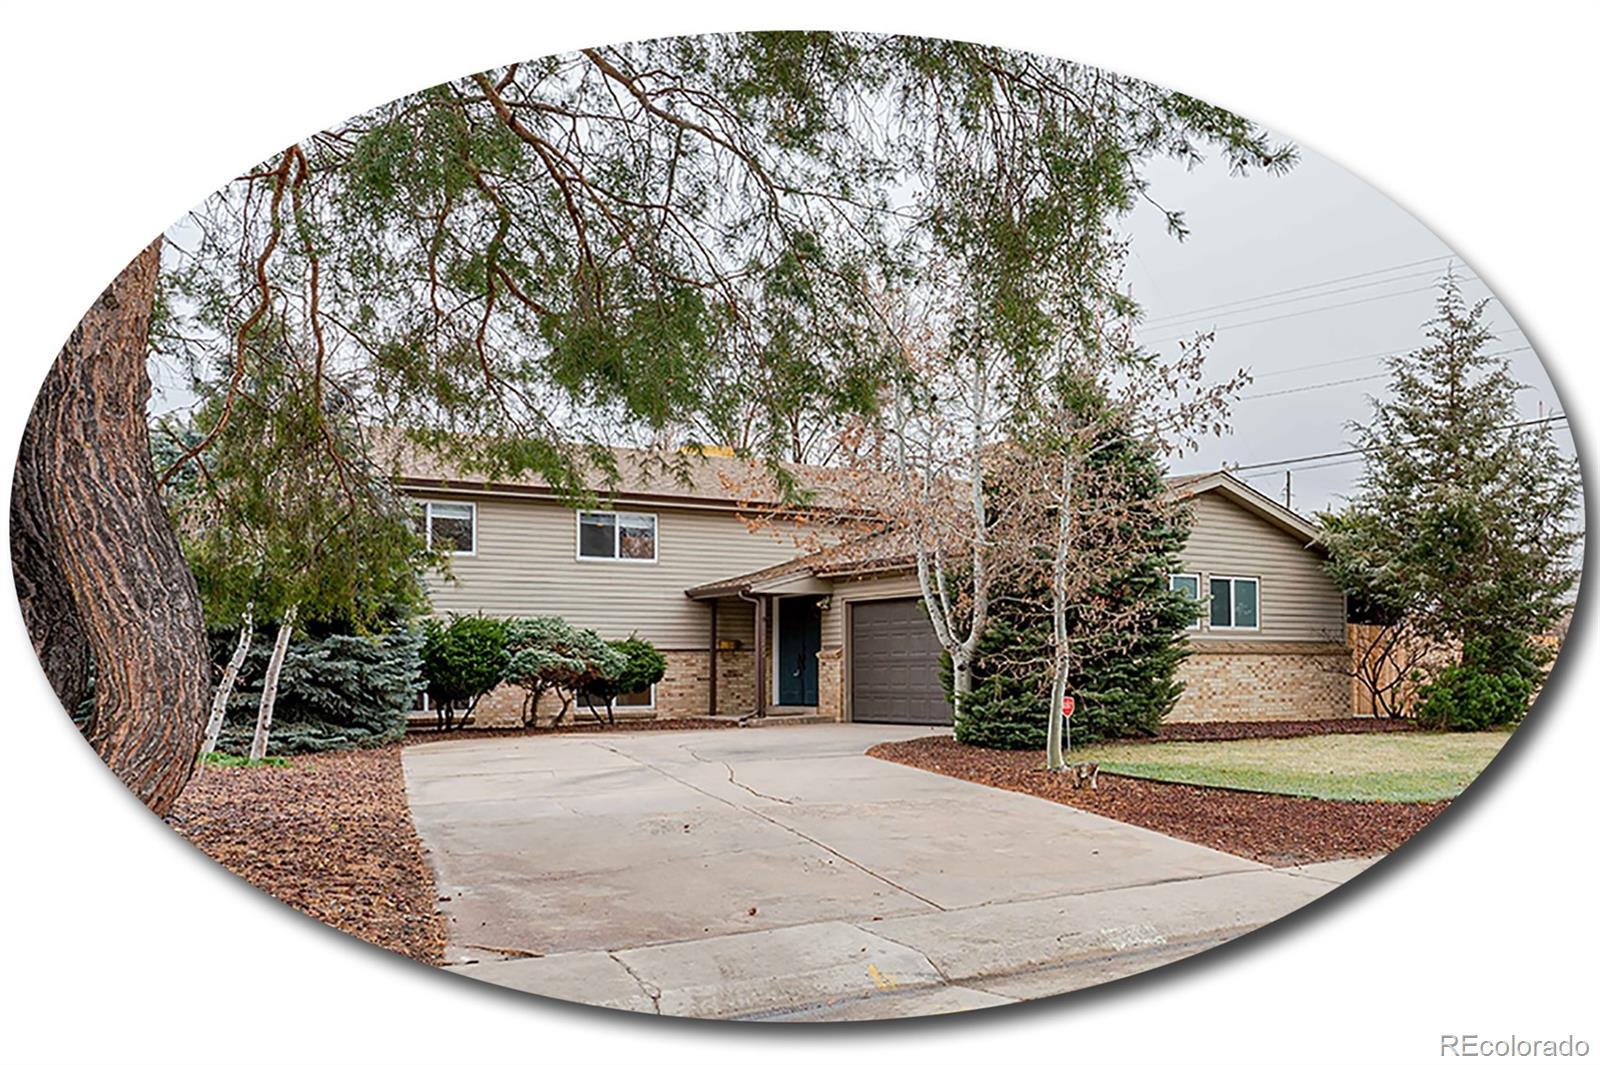 800 E Dogwood Avenue, Centennial, CO 80121 - Centennial, CO real estate listing